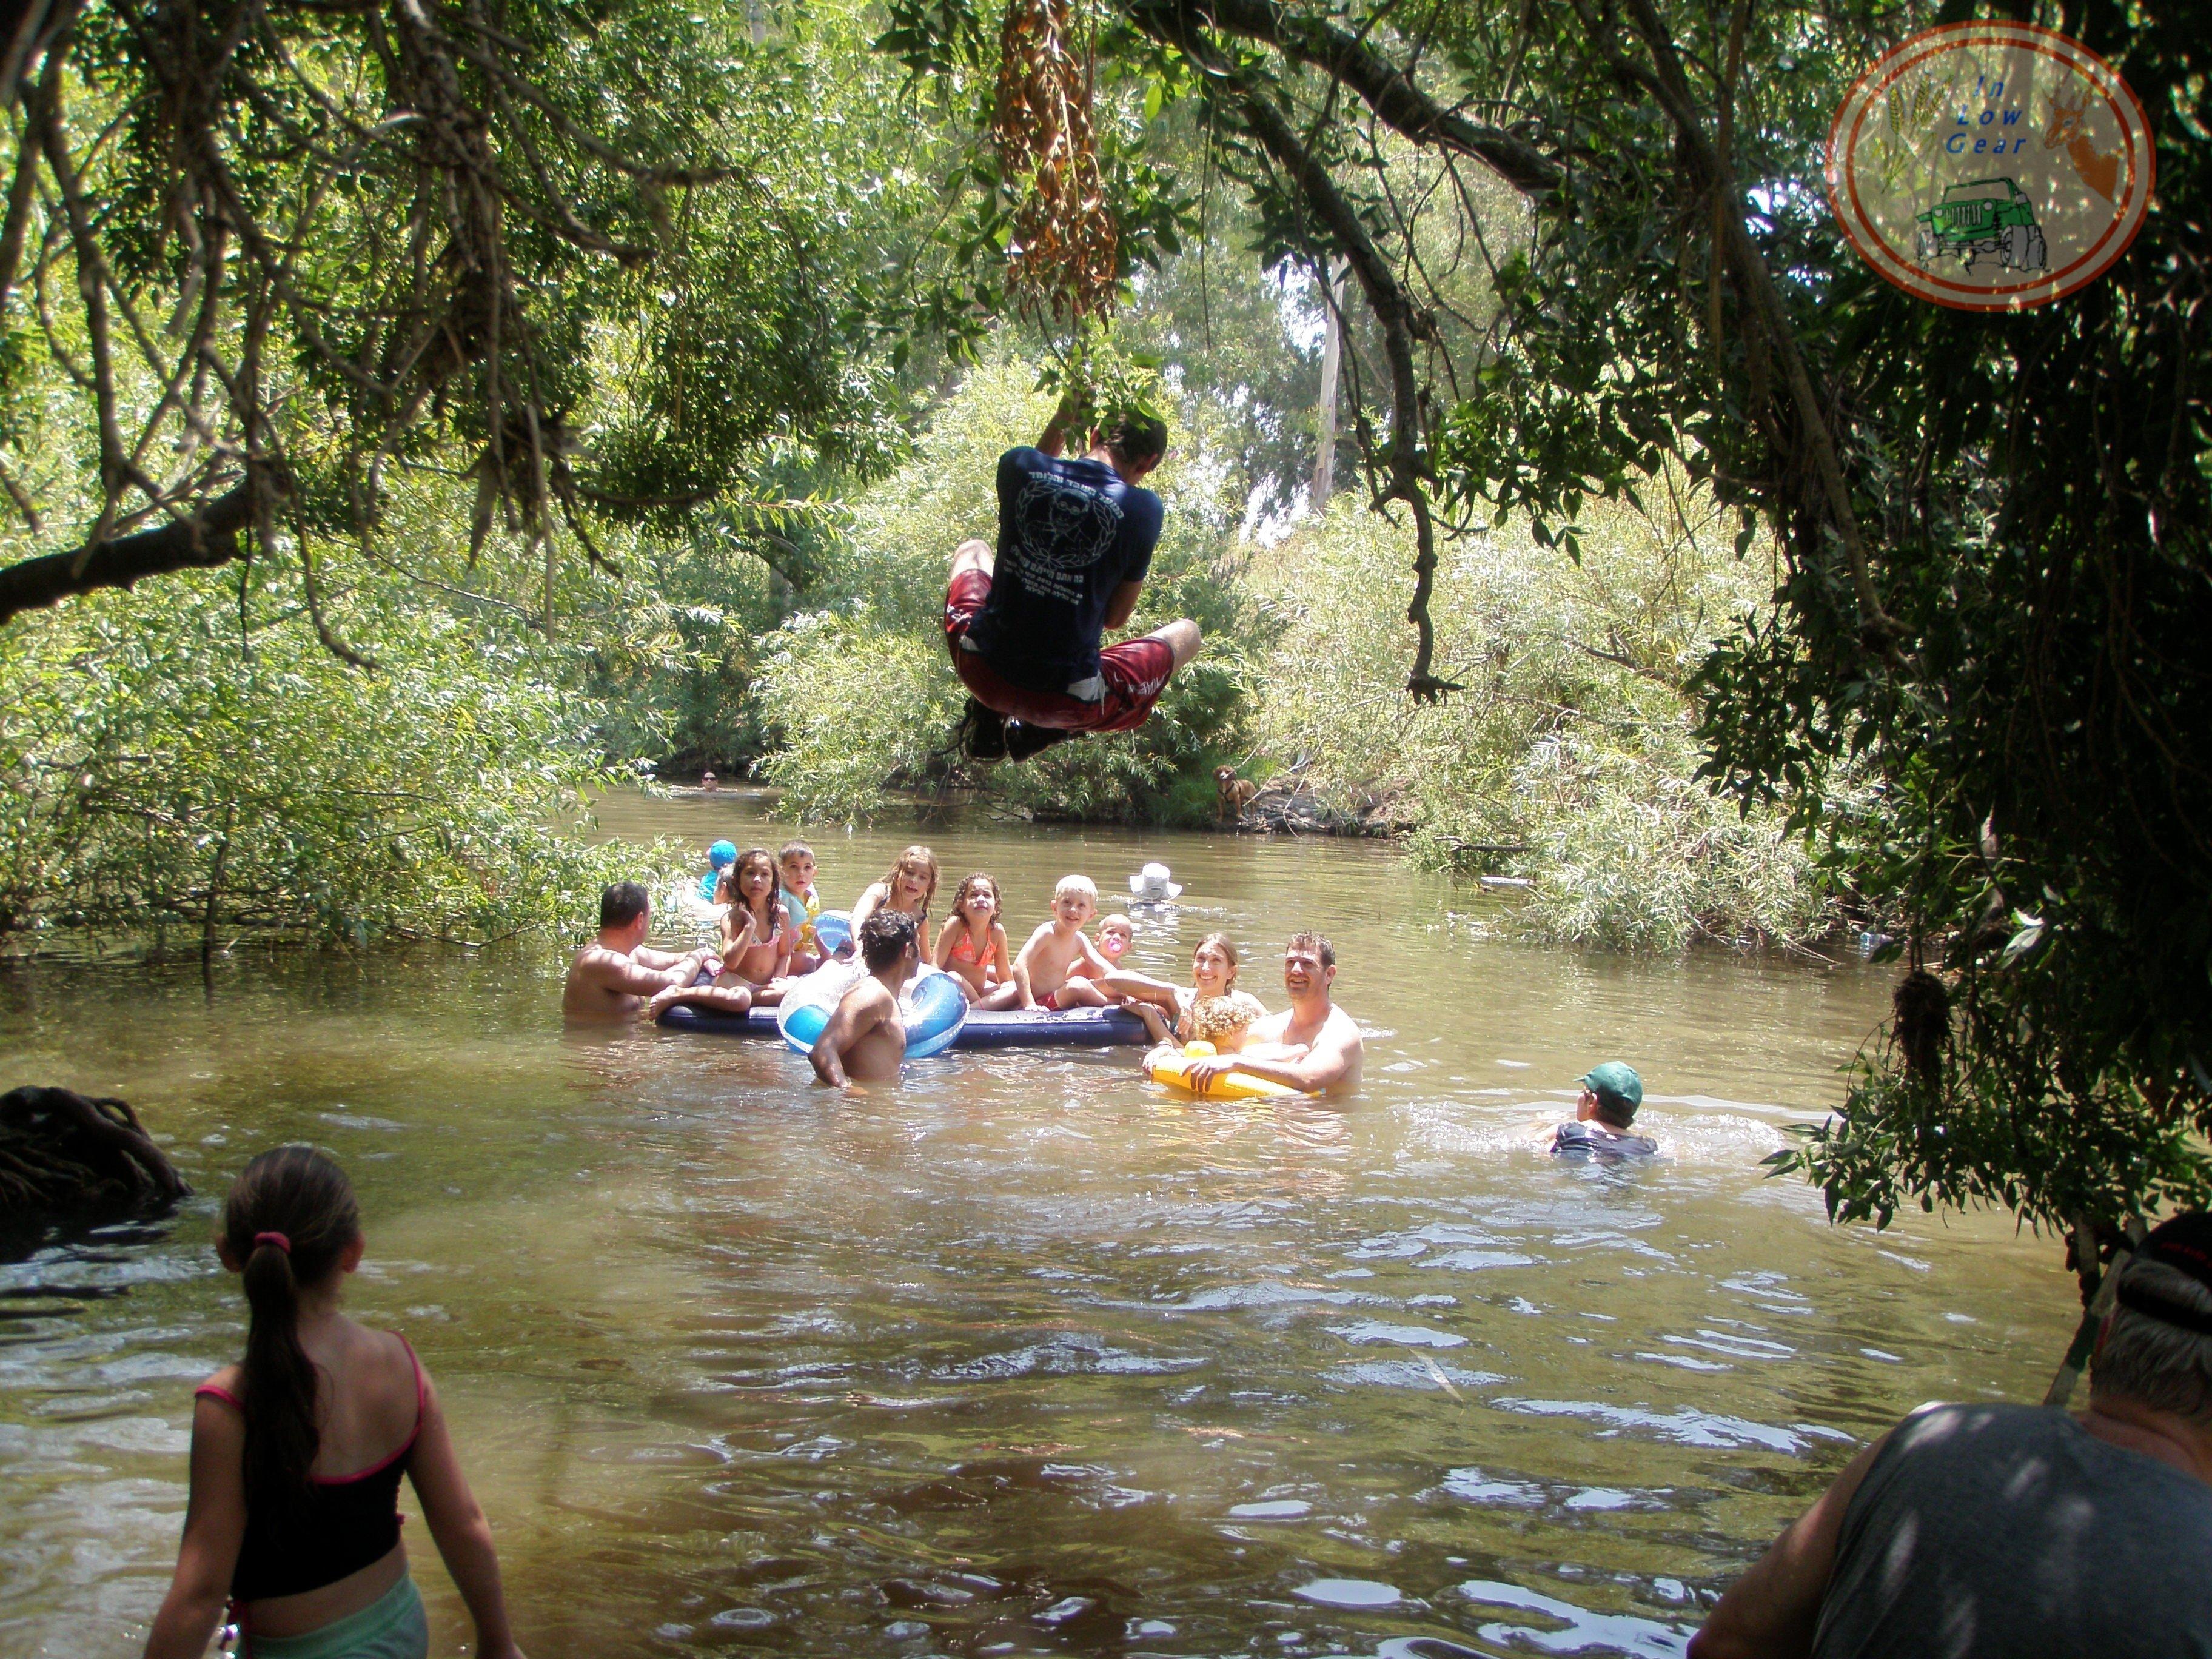 Jeep tours Golan: Zaki water track. טיולי ג'יפים גולן: מסלול הליכה בזכי